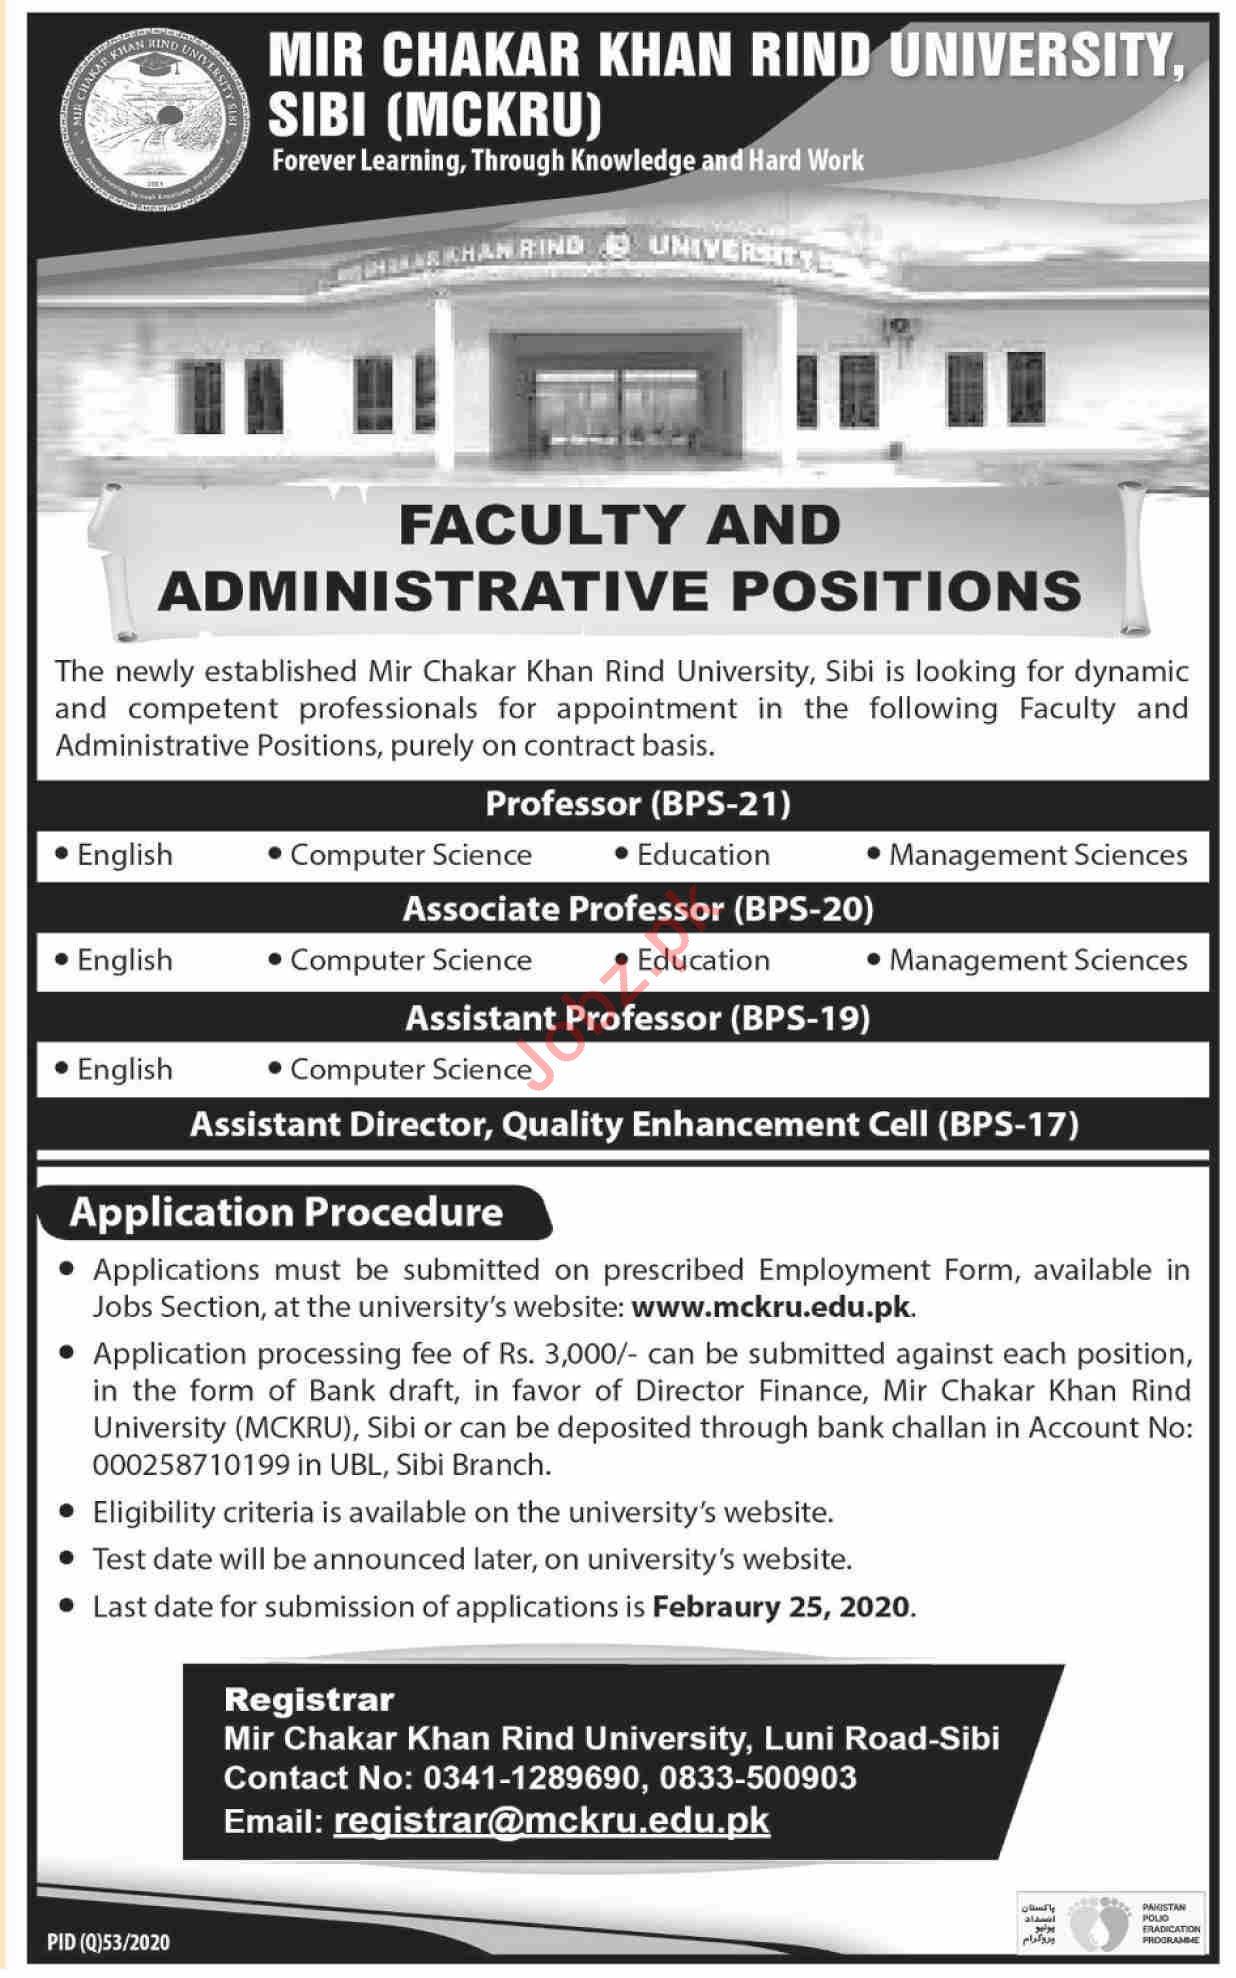 Mir Chakar Khan Rind University MCKRU Jobs 2020 in Sibi